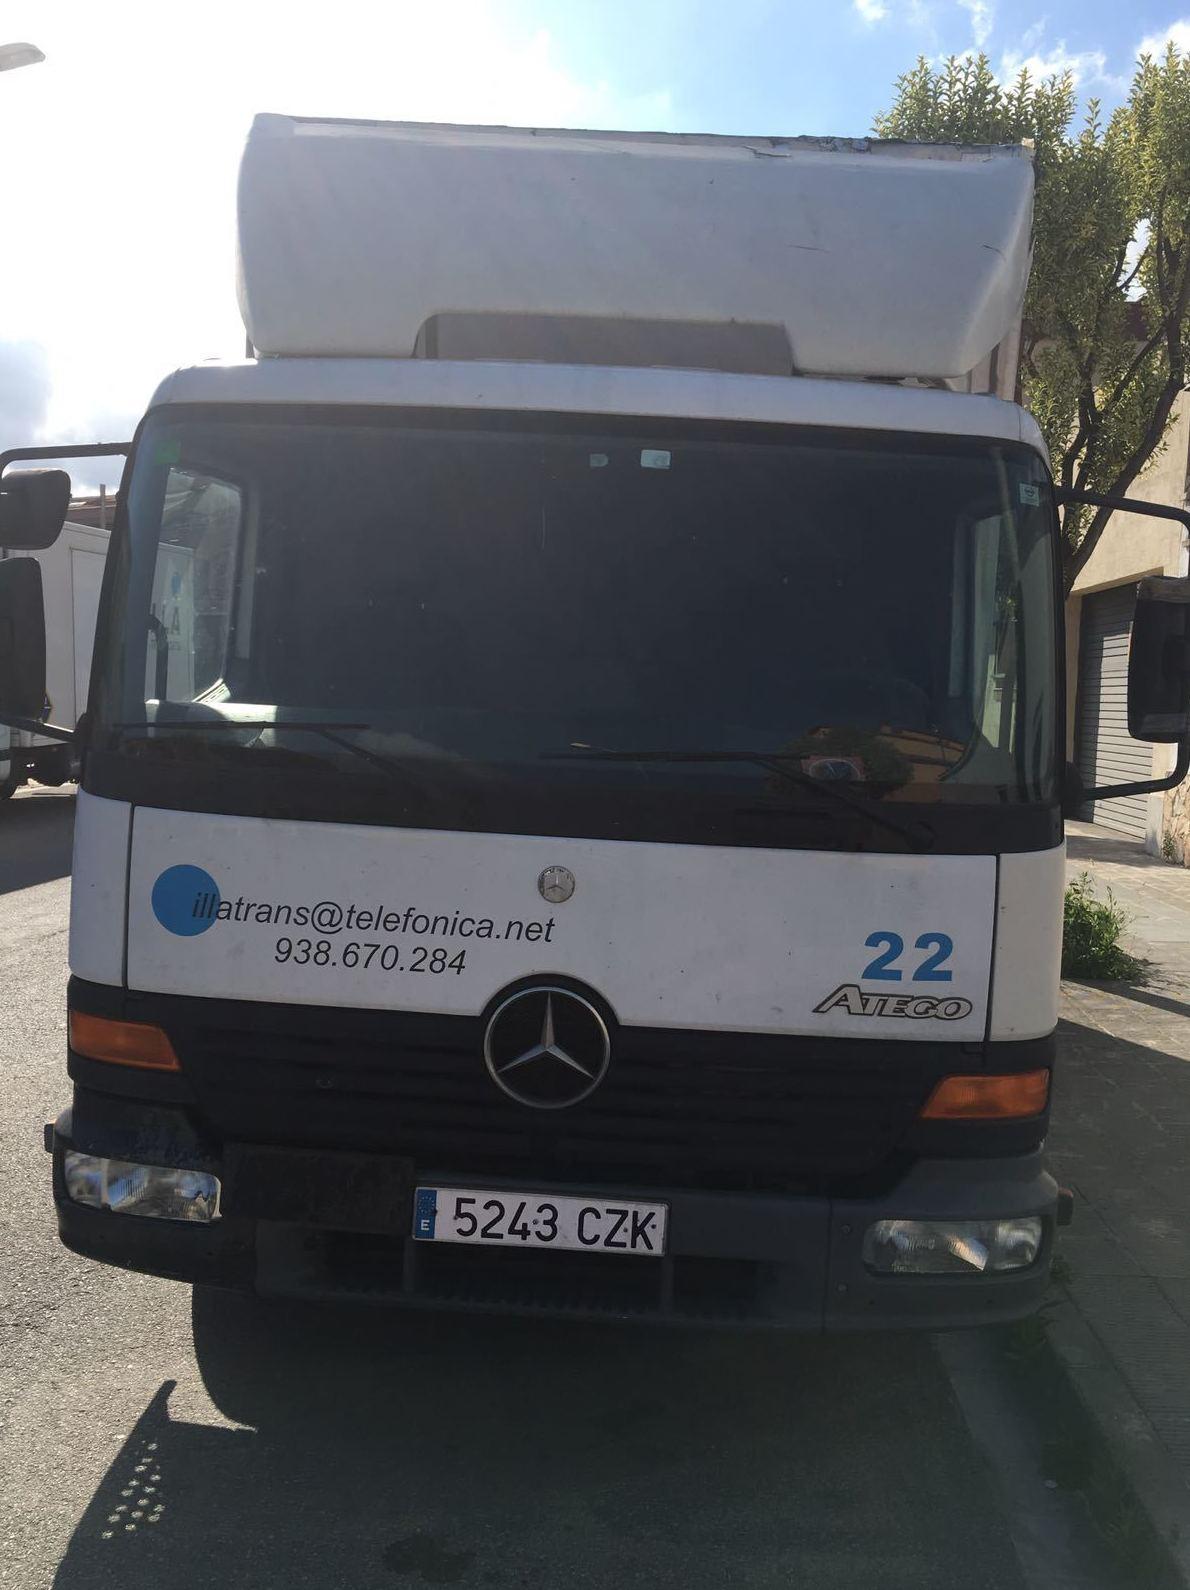 Foto 15 de Mensajería en Sant Celoni | Illa Transports